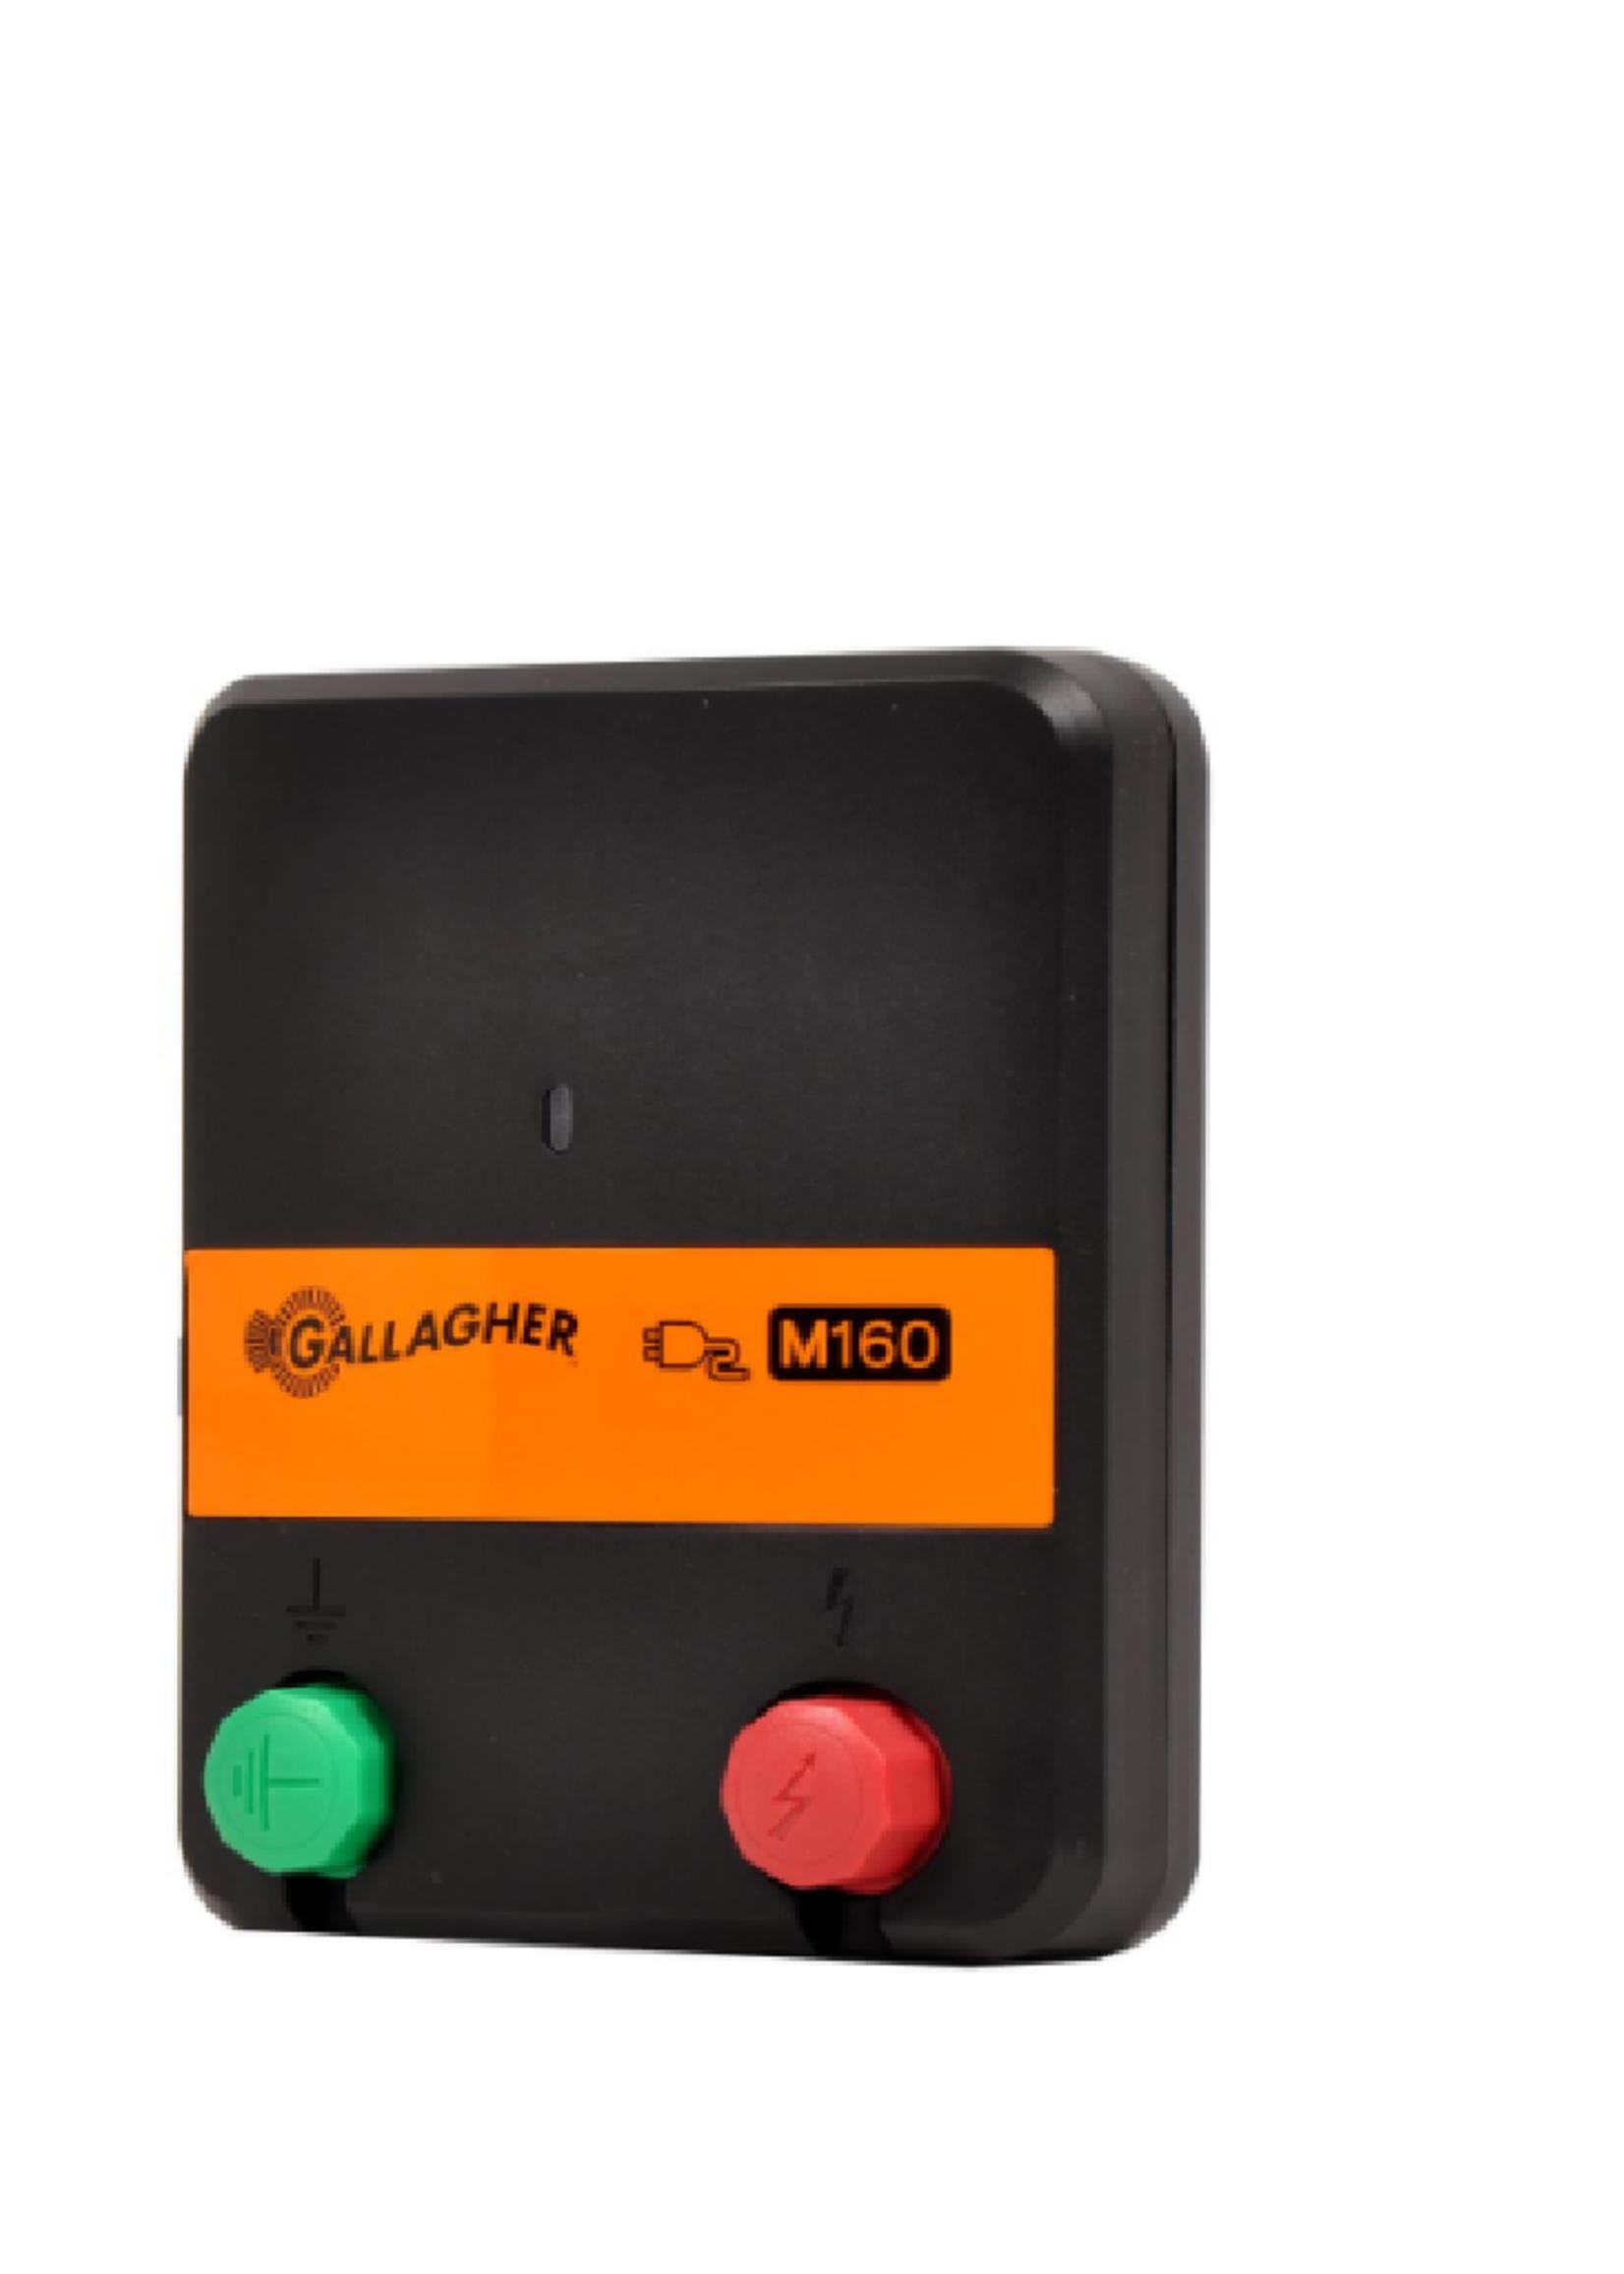 Gallagher Gallagher M160 schrikdraad apparaat